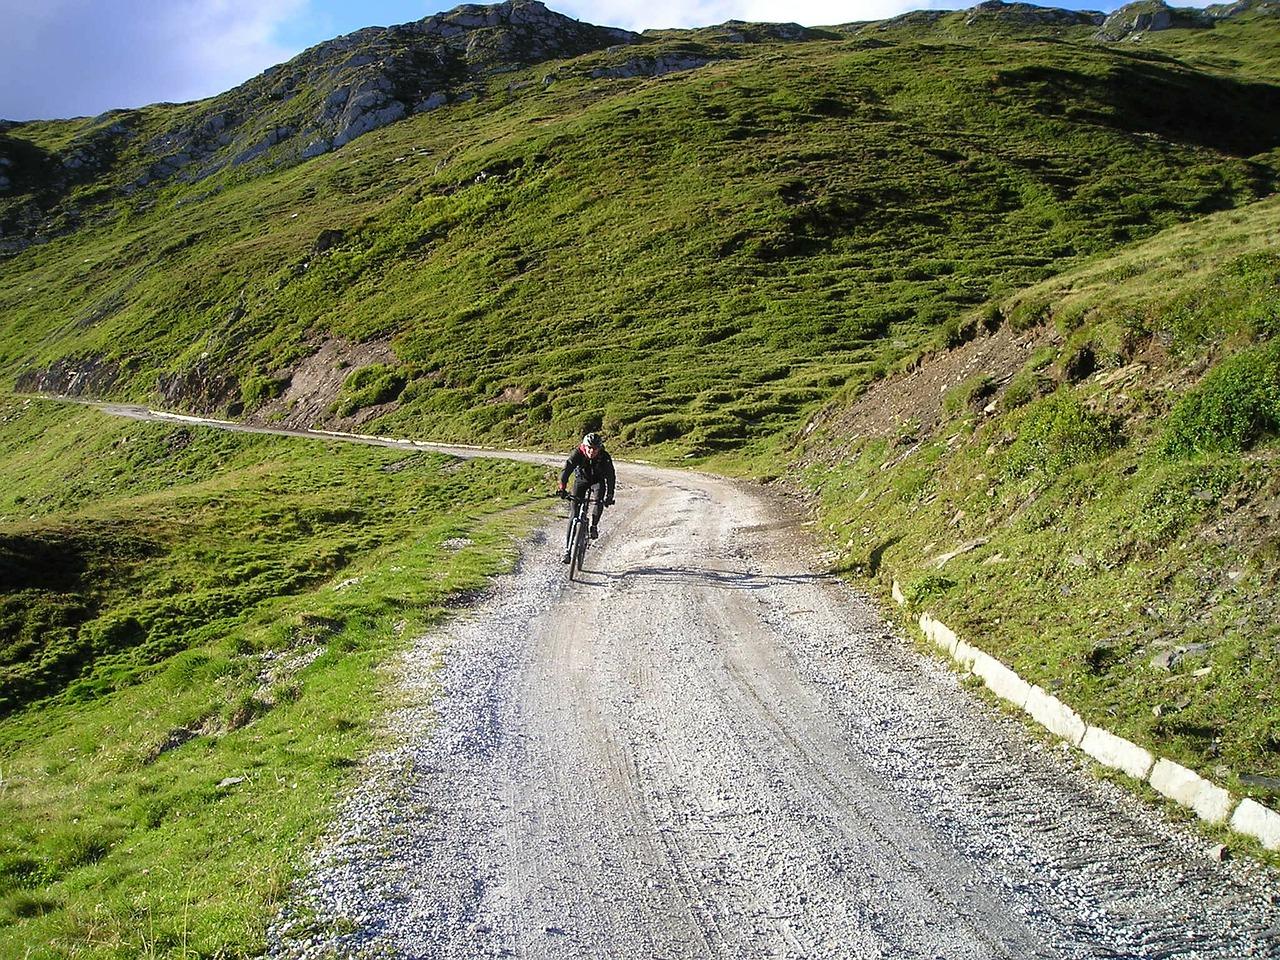 gravel-road-55354_1280